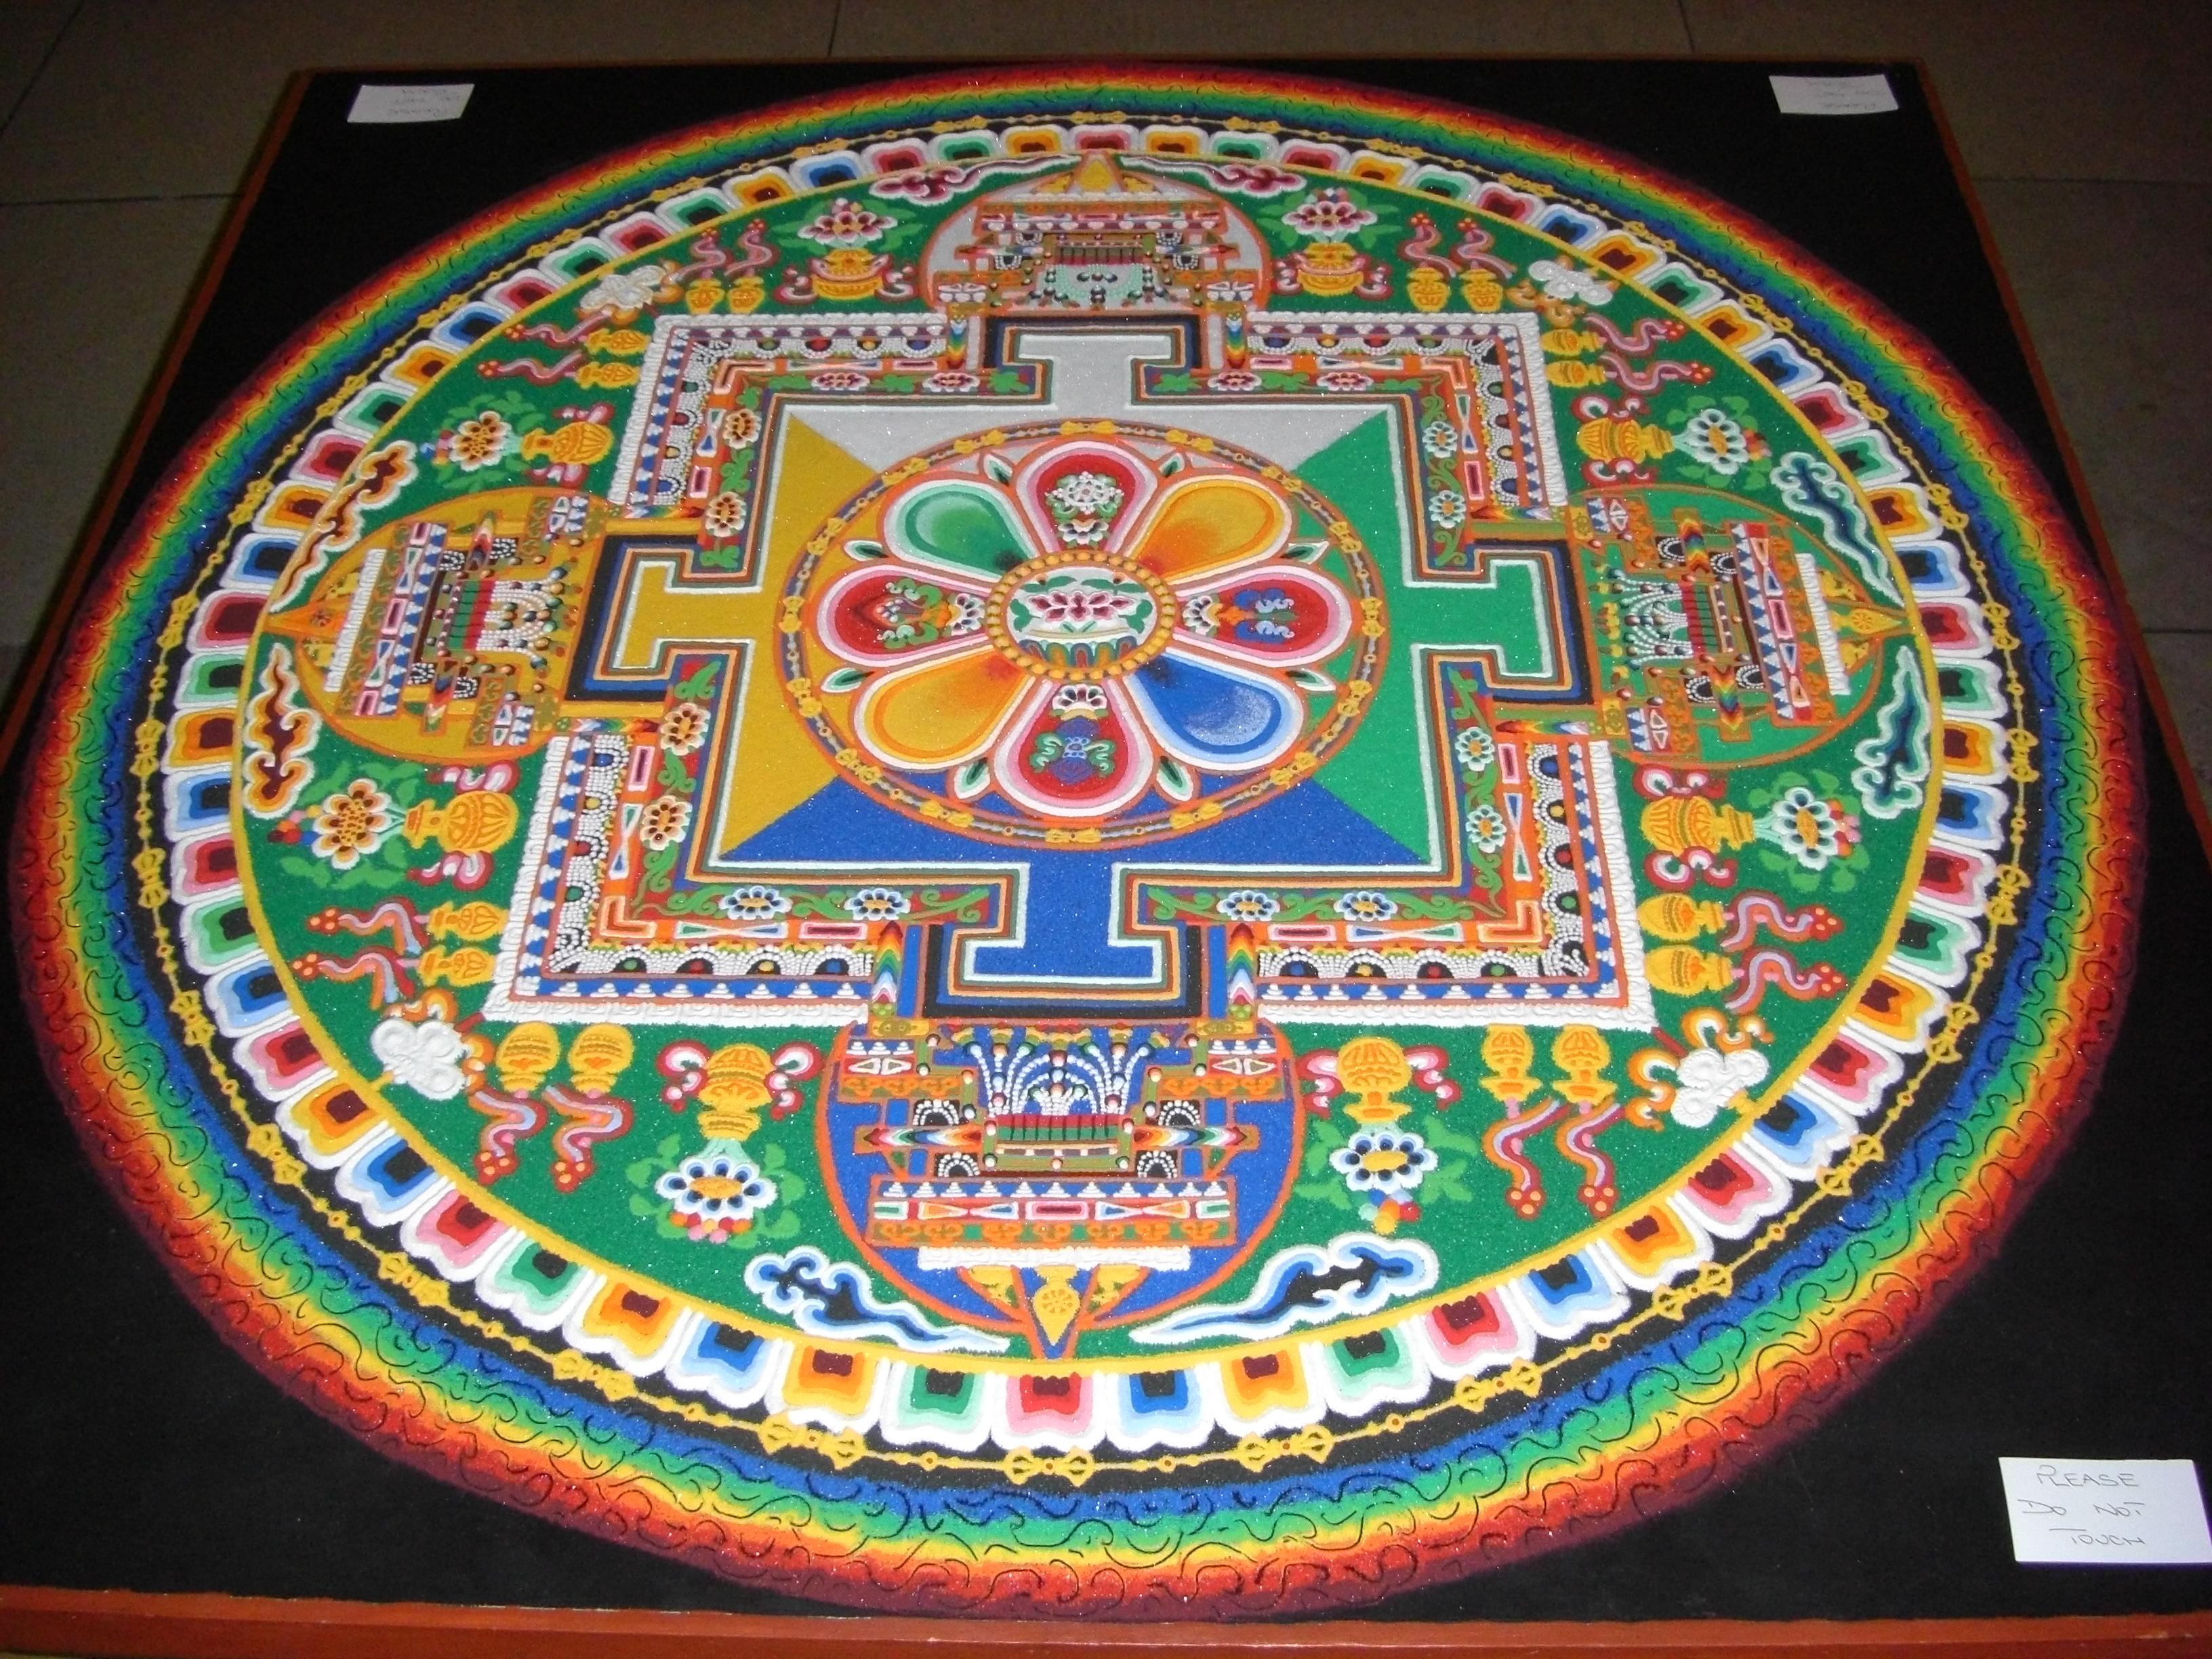 Art Show Mandala Design Mandalas Chenrezig Sands United Kingdom